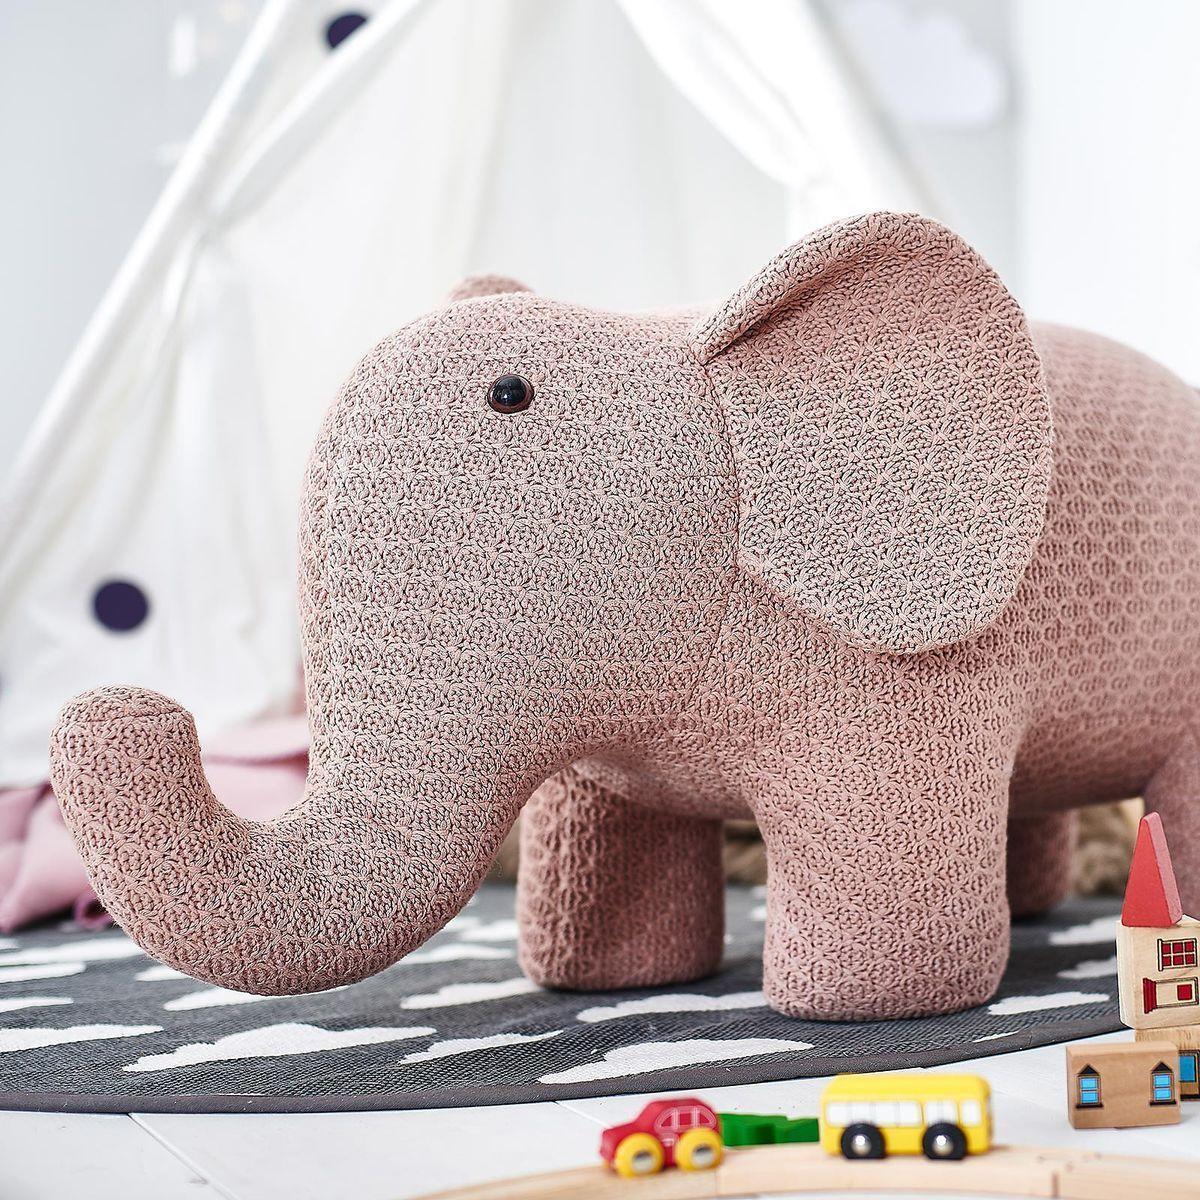 Hocker Elefant 95x34x47cm Altrosahocker Elefant 95x34x47cm Altrosa Altrosa Elefanten Hocker Babyzimmer